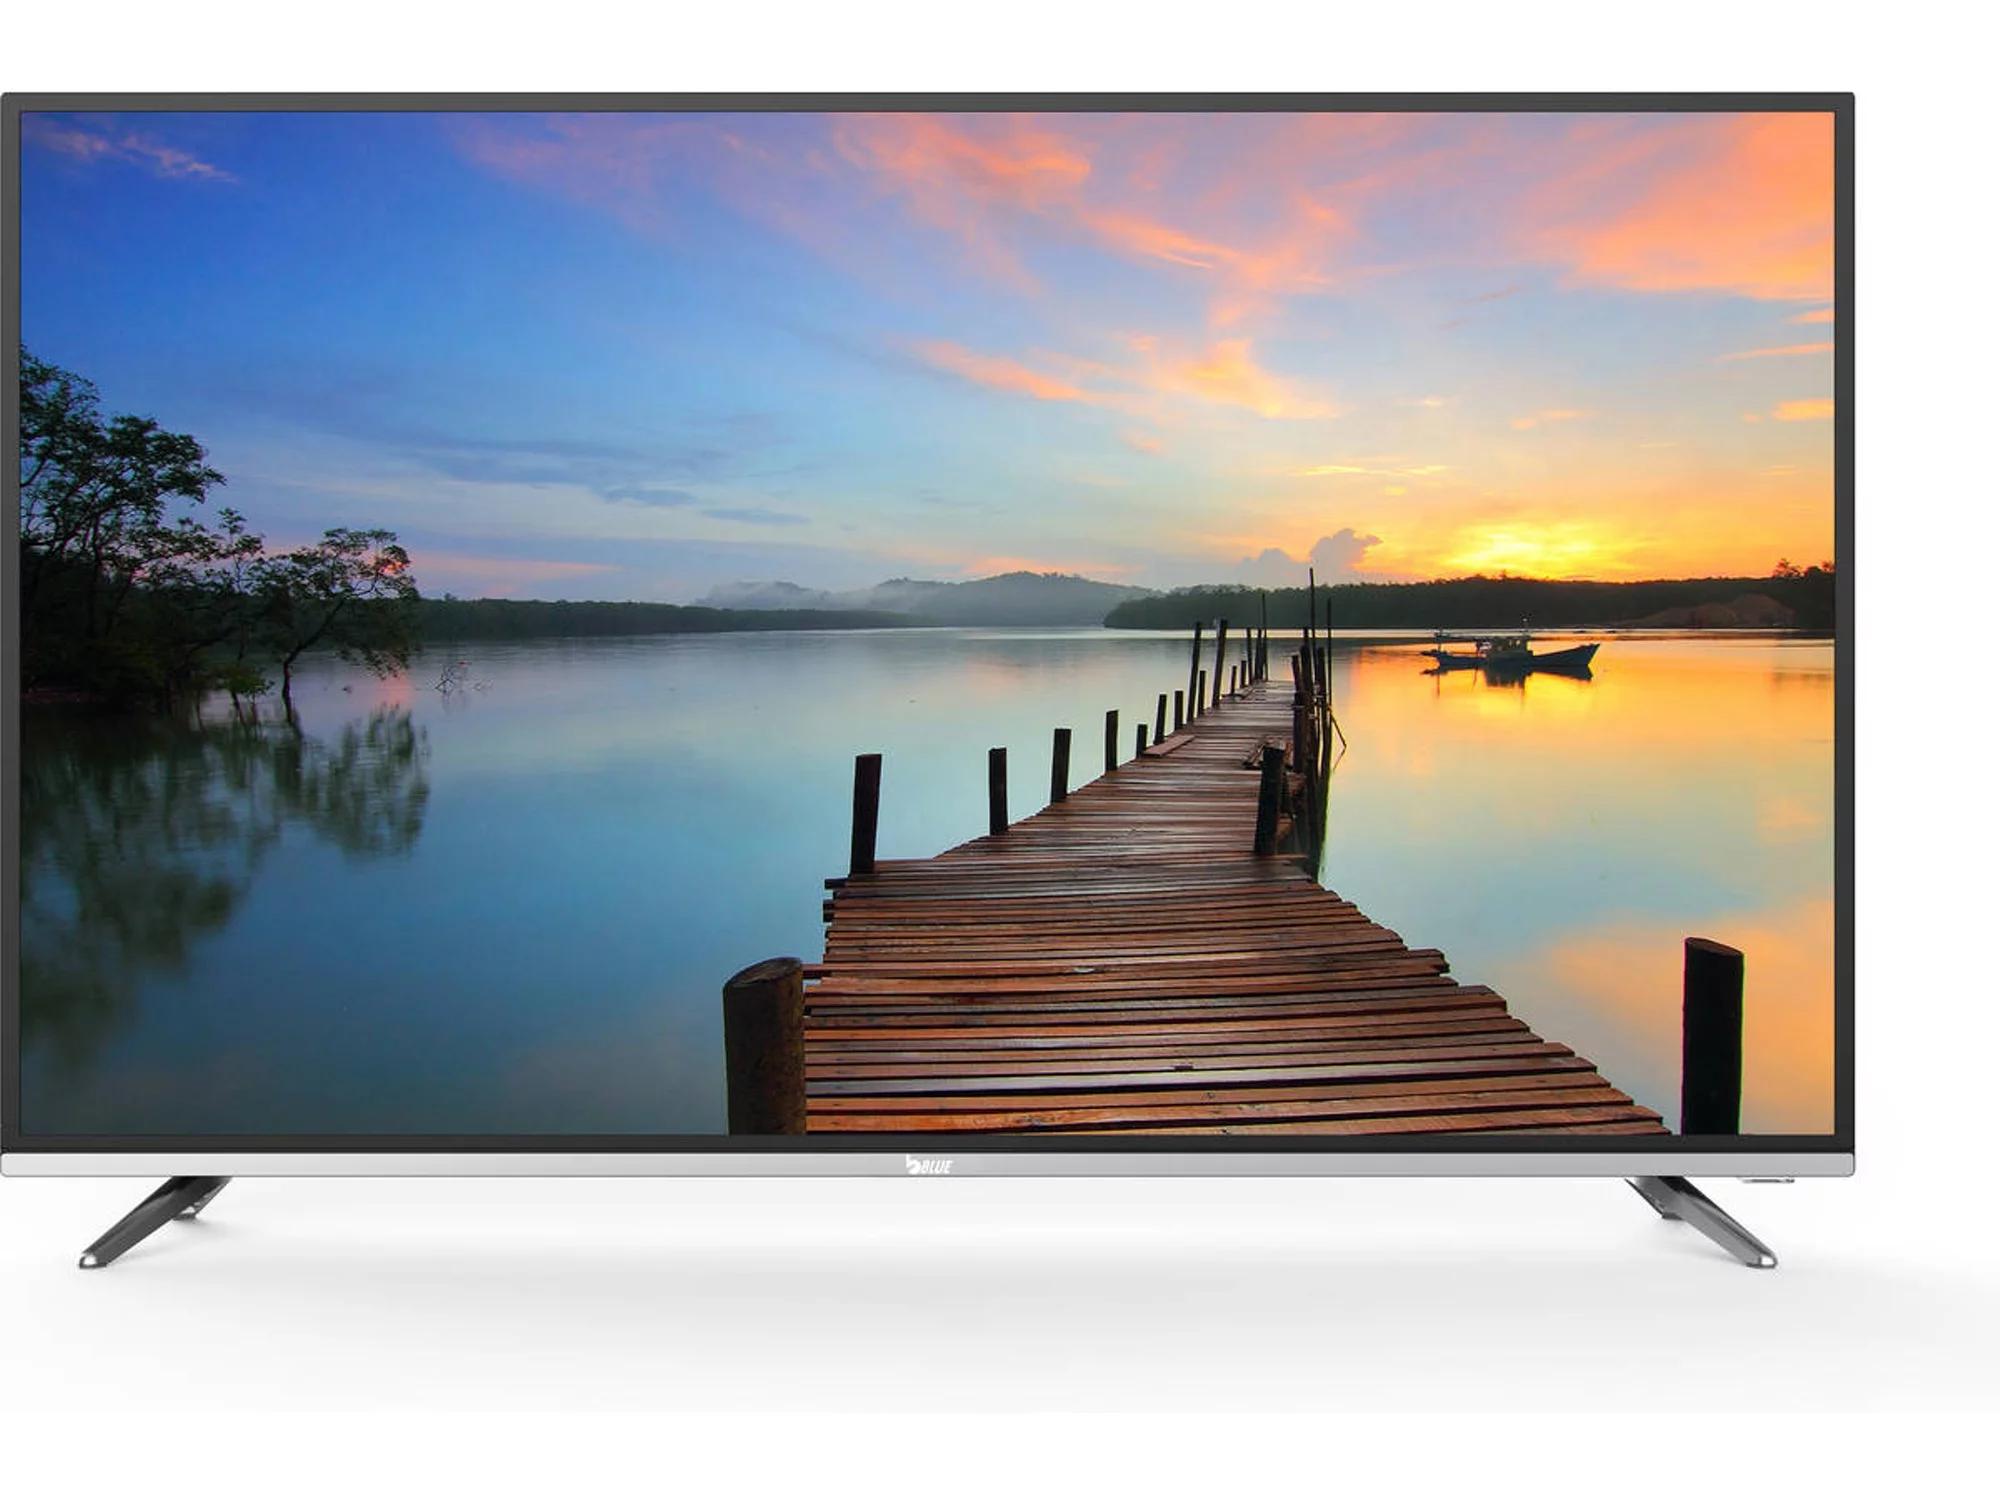 TV BLUE LED - 43'' 4K Ultra HD- Smart TV